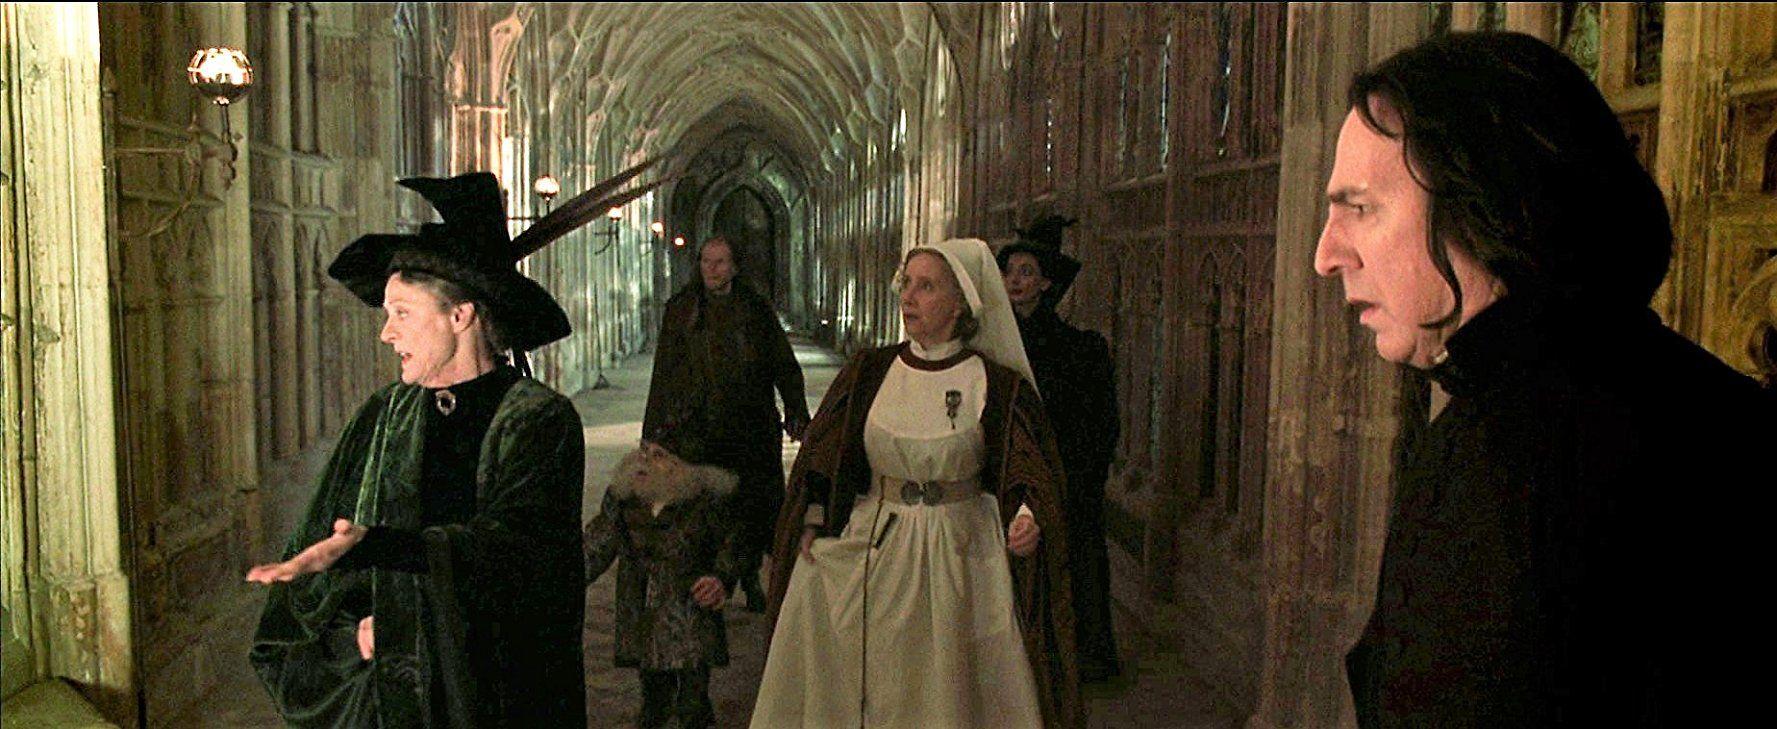 Alan Rickman Warwick Davis Maggie Smith David Bradley Gemma Jones And Sally Mortemore In Harry Potter And The Chamber Of Secrets 2002